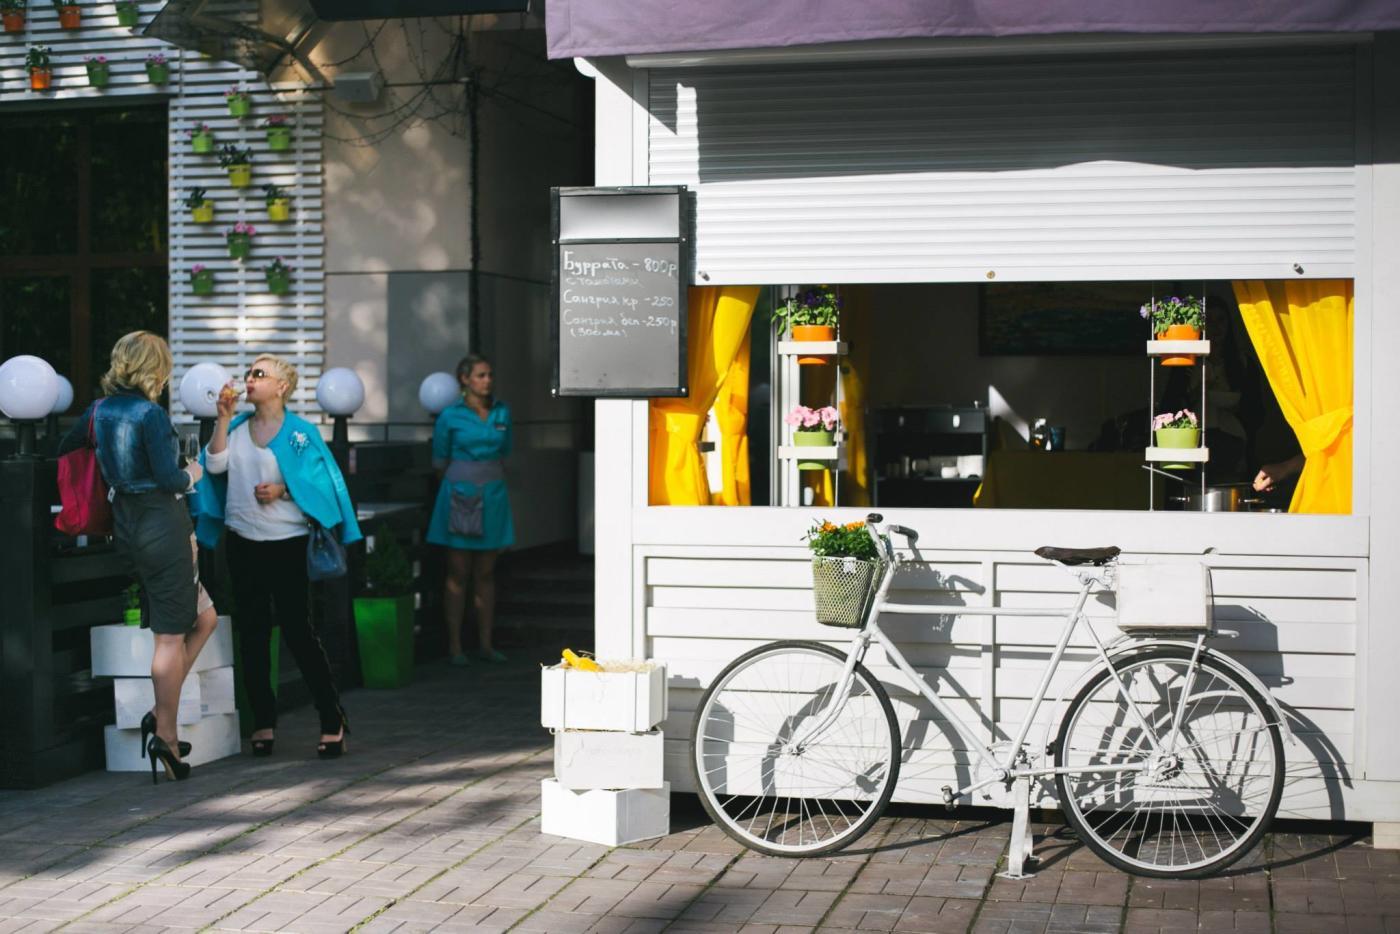 Кафе Гарден в Зеленограде (Garden) фото 46